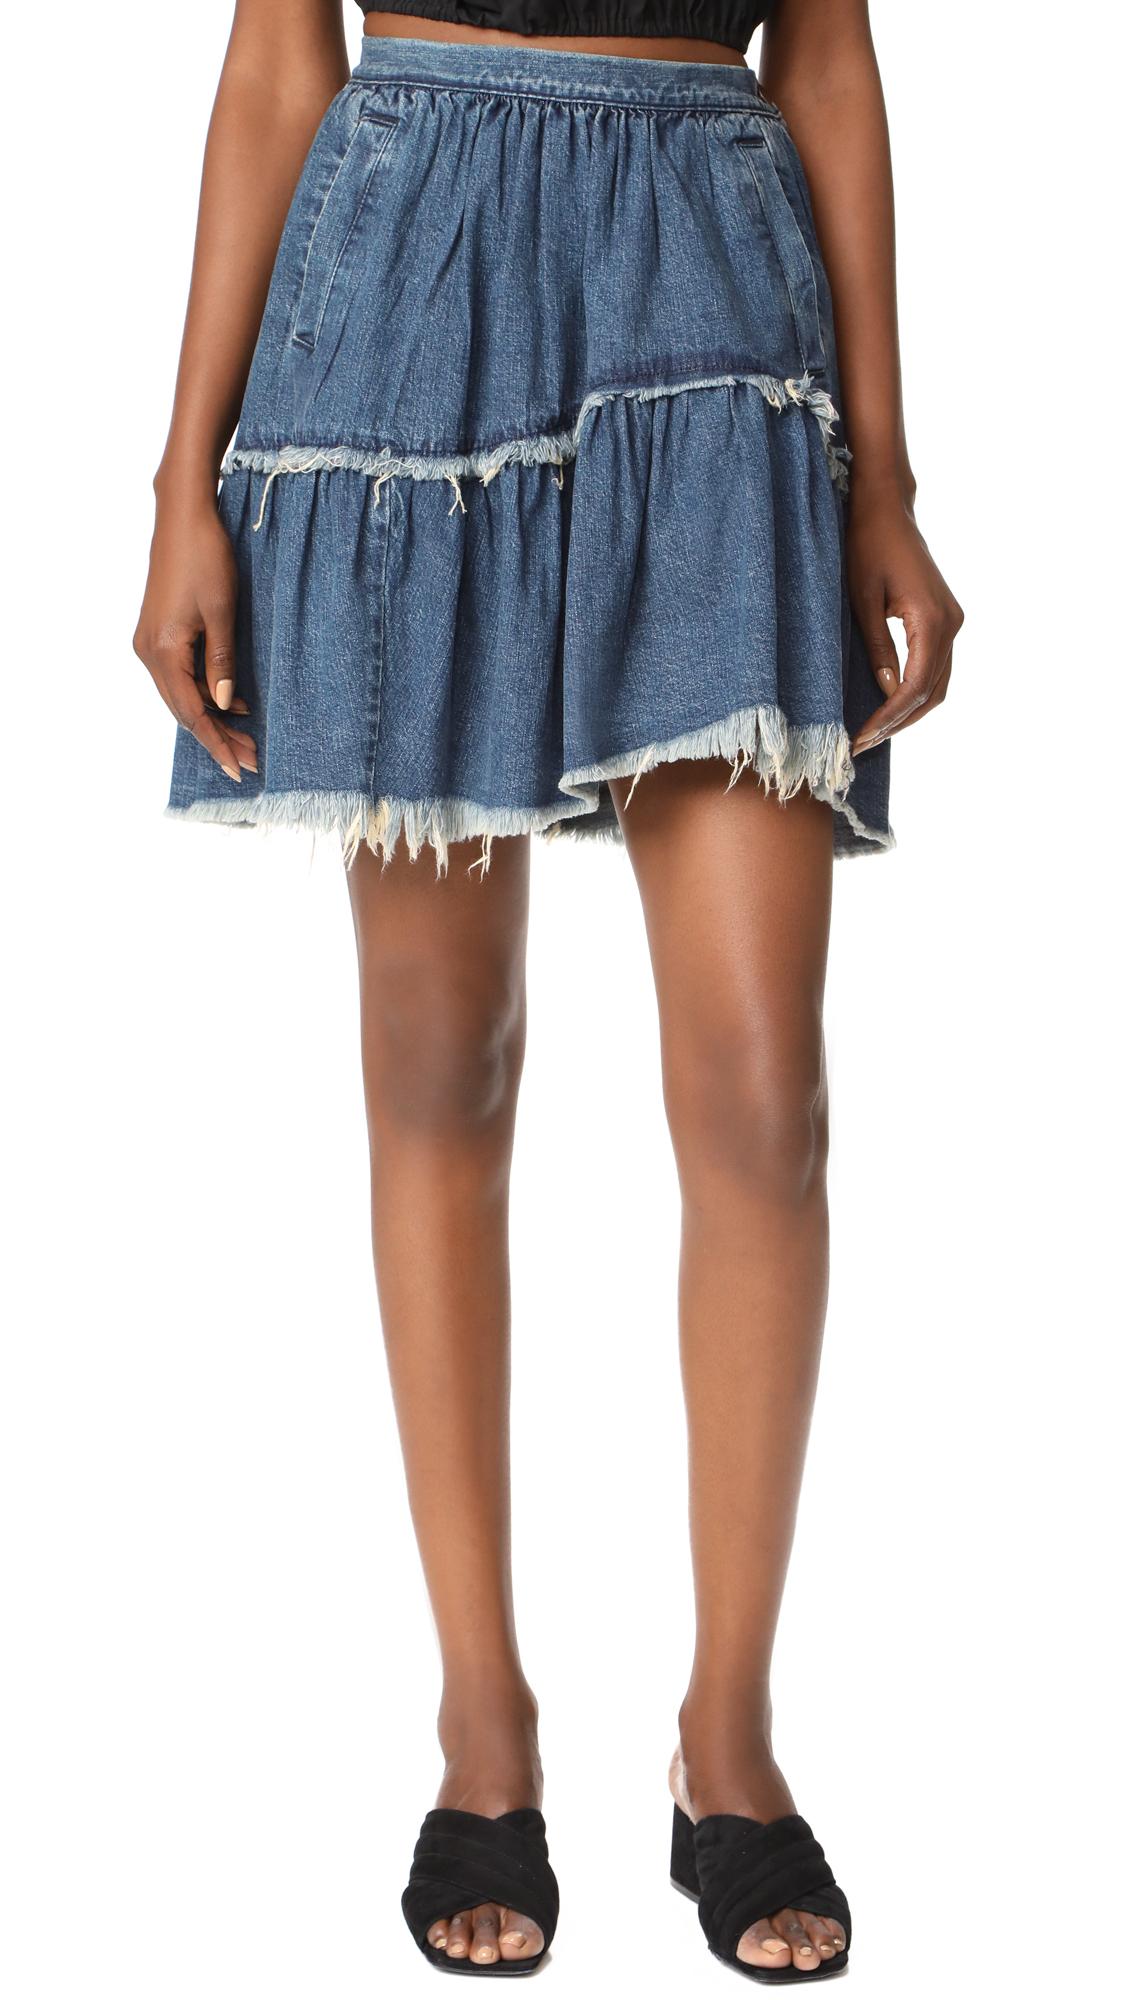 Rachel Comey Denim Crinoline Skirt - Classic Indigo